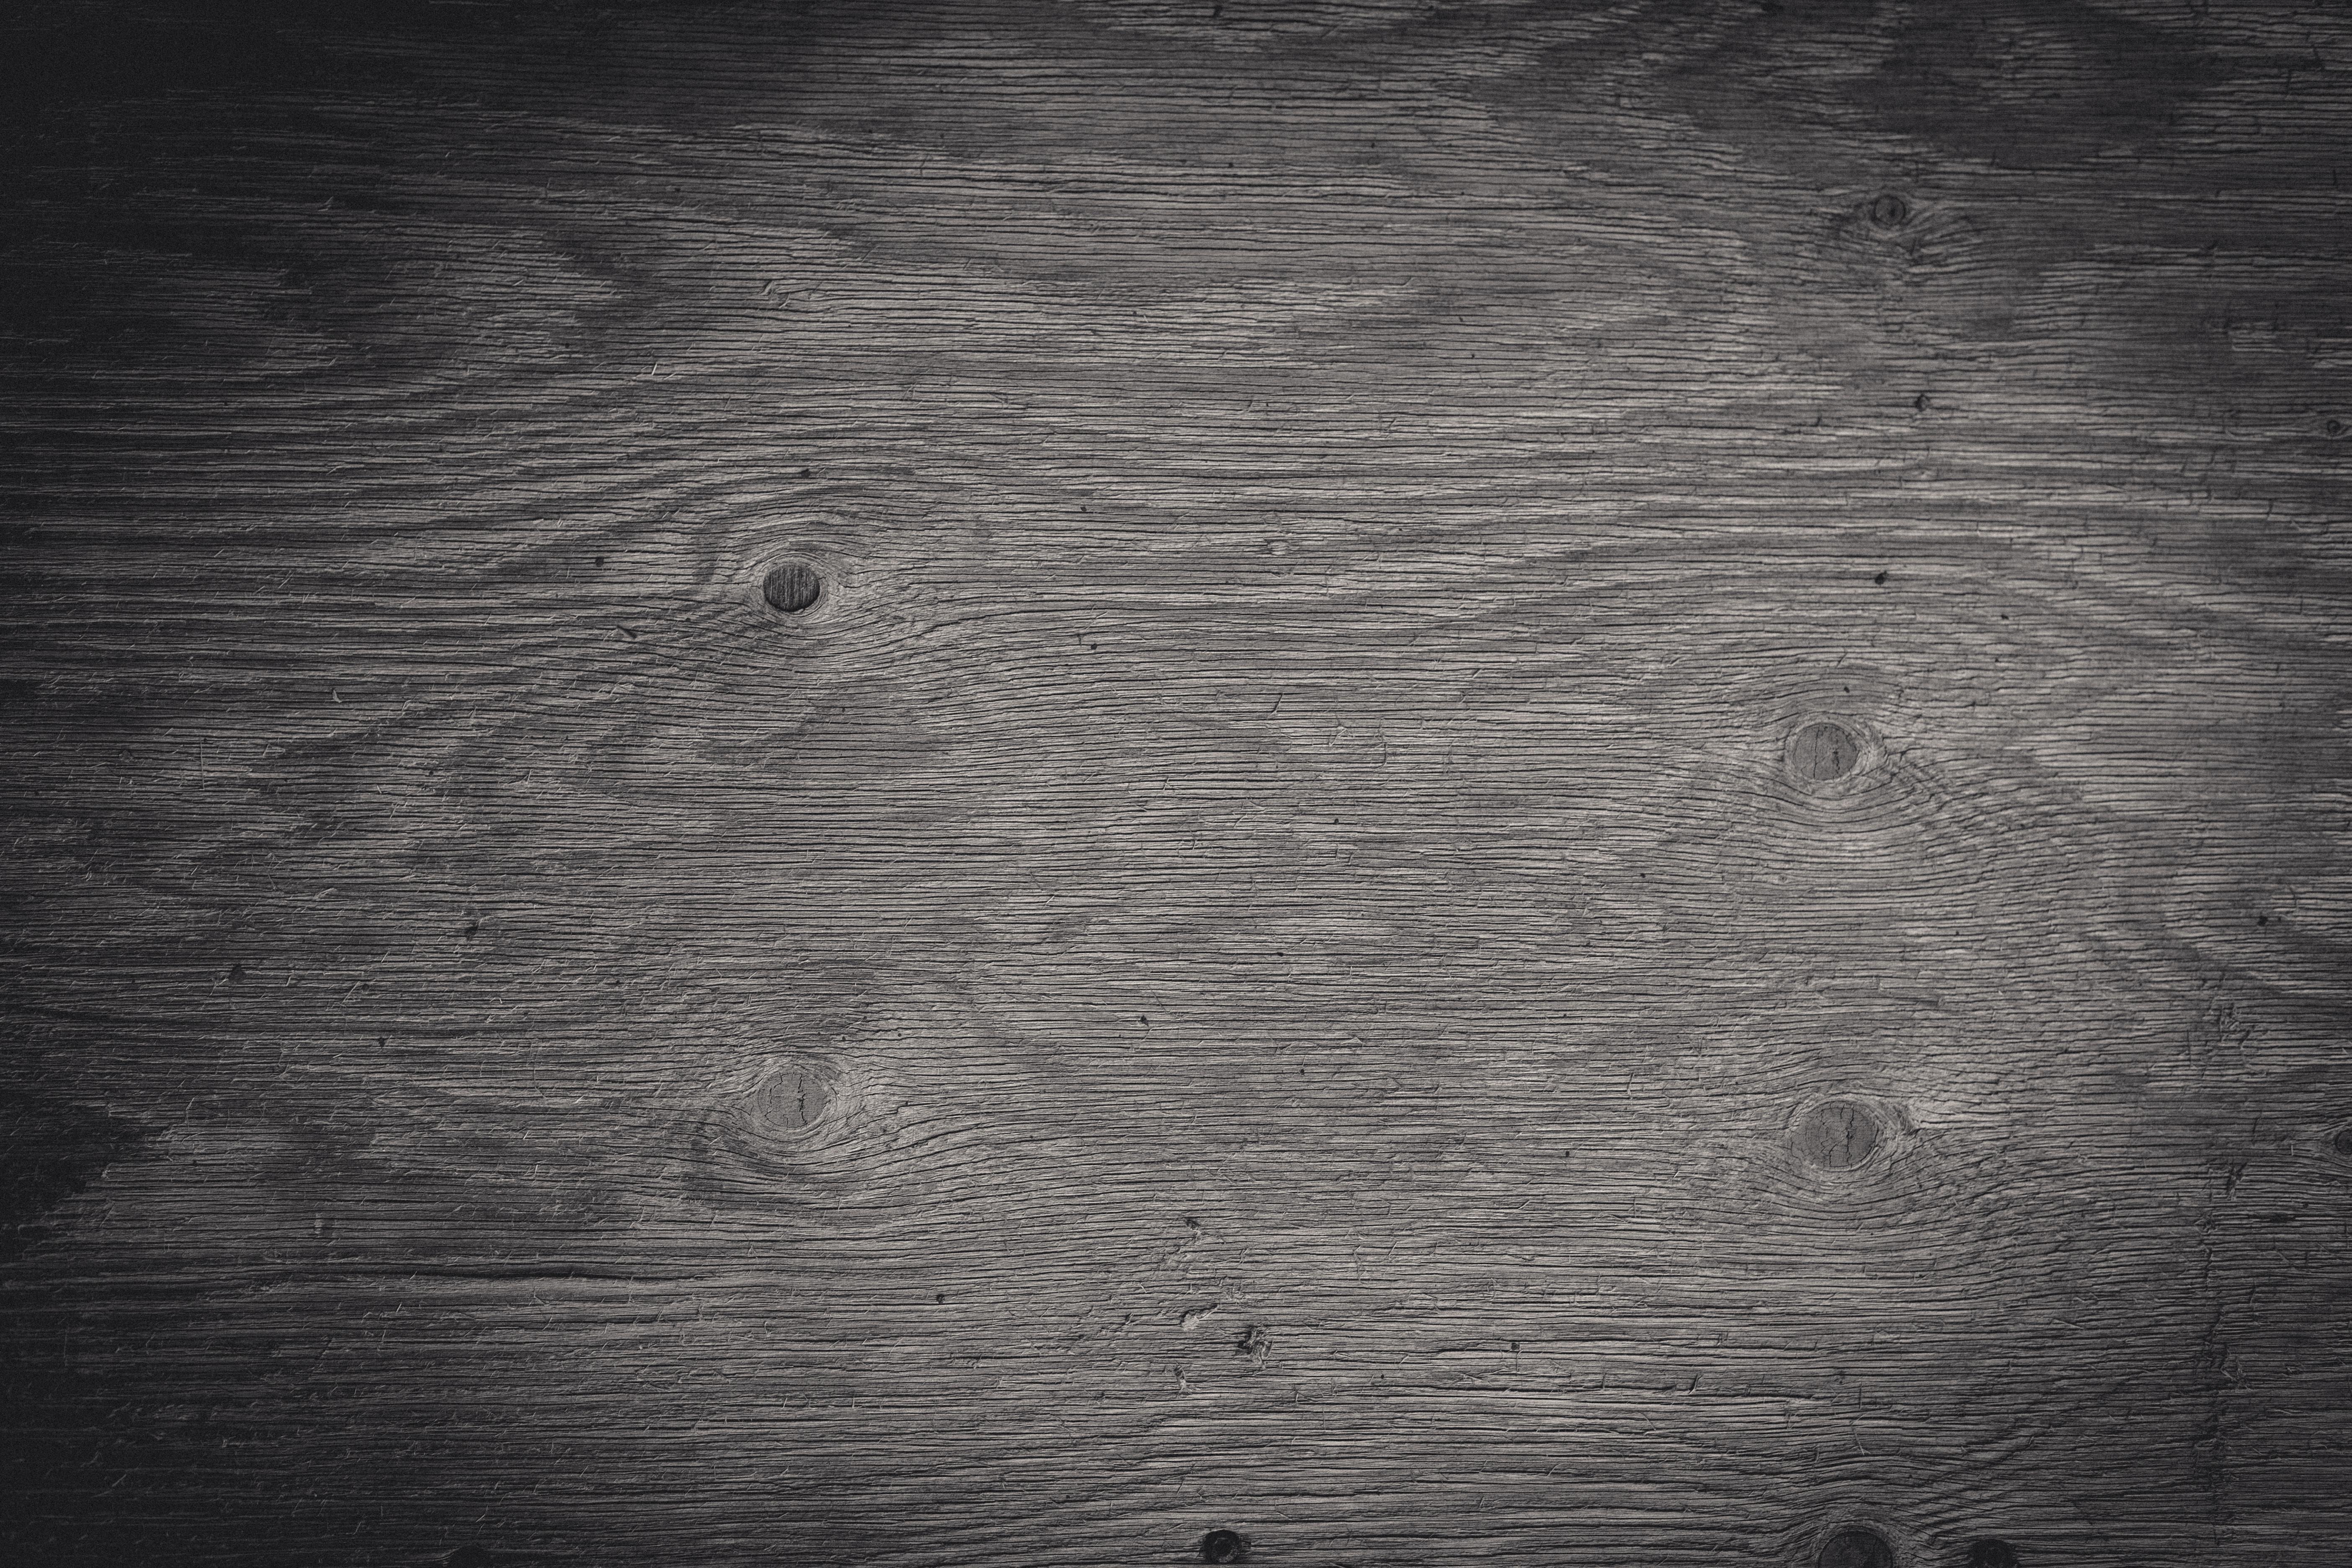 Black & white wood texture photo